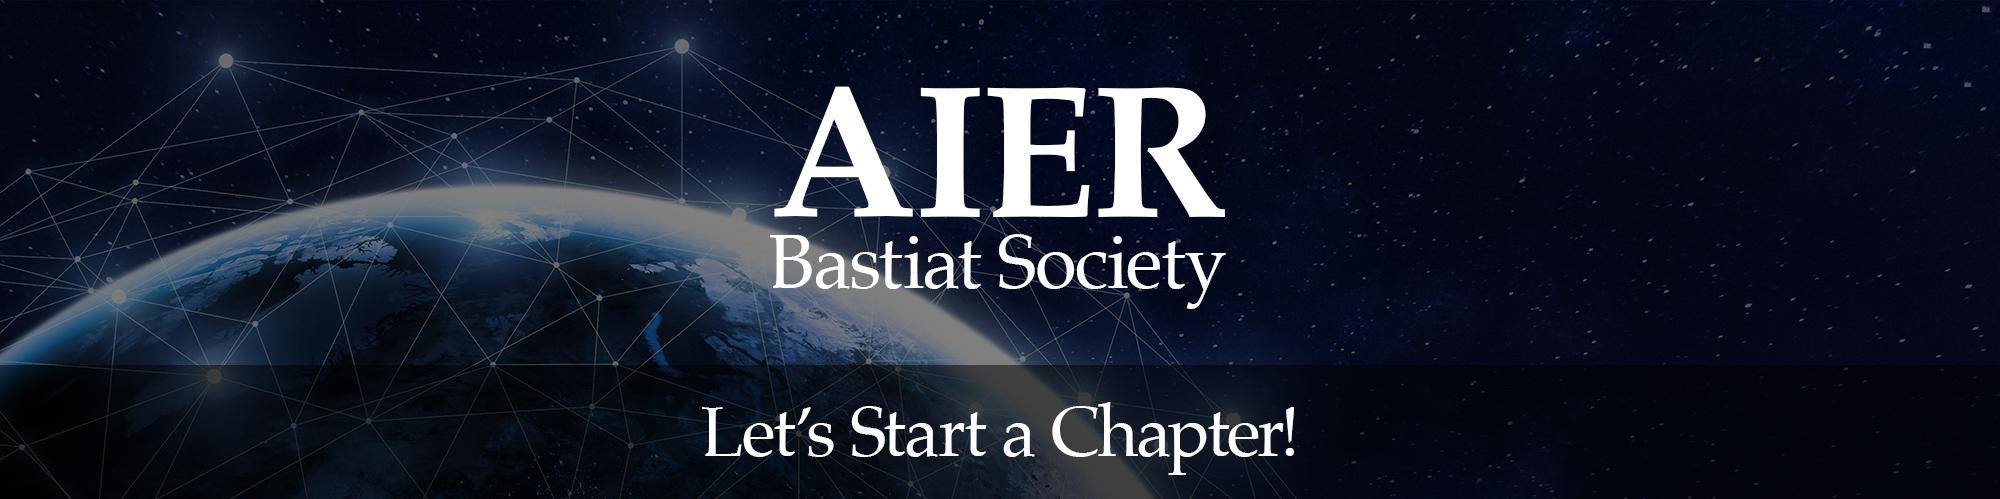 Let's Start a Bastiat Society Chapter!